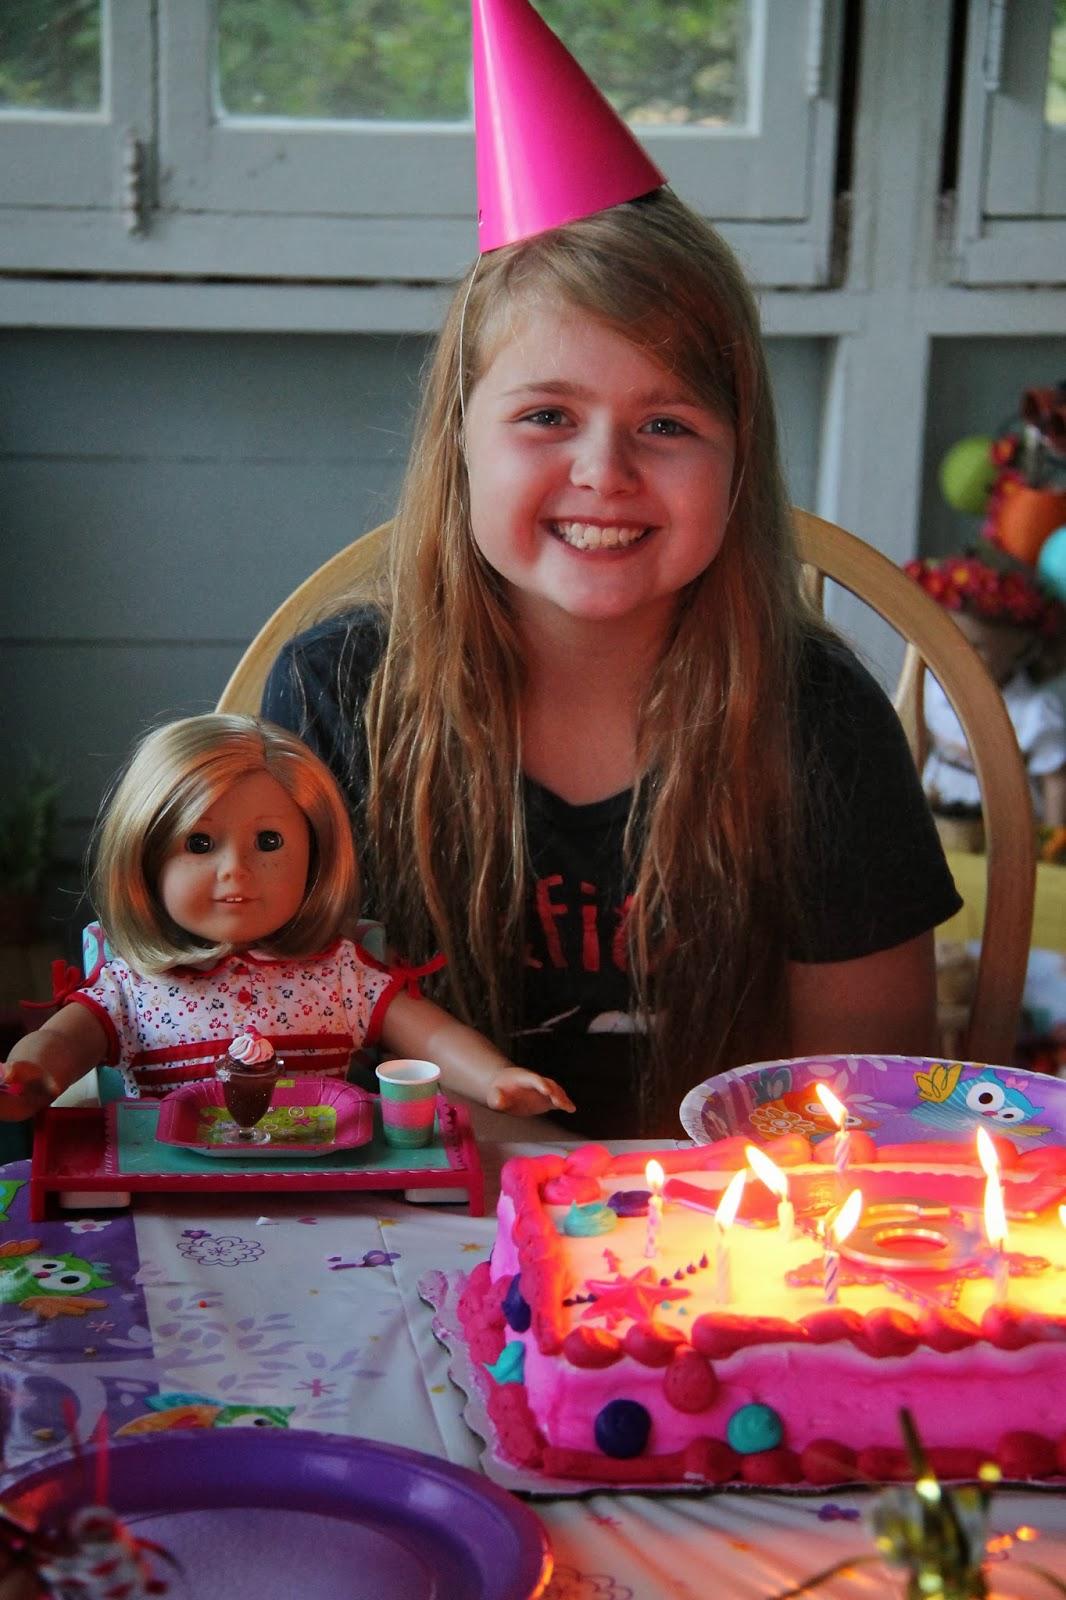 American Girl Doll Play An American Girl Birthday Party